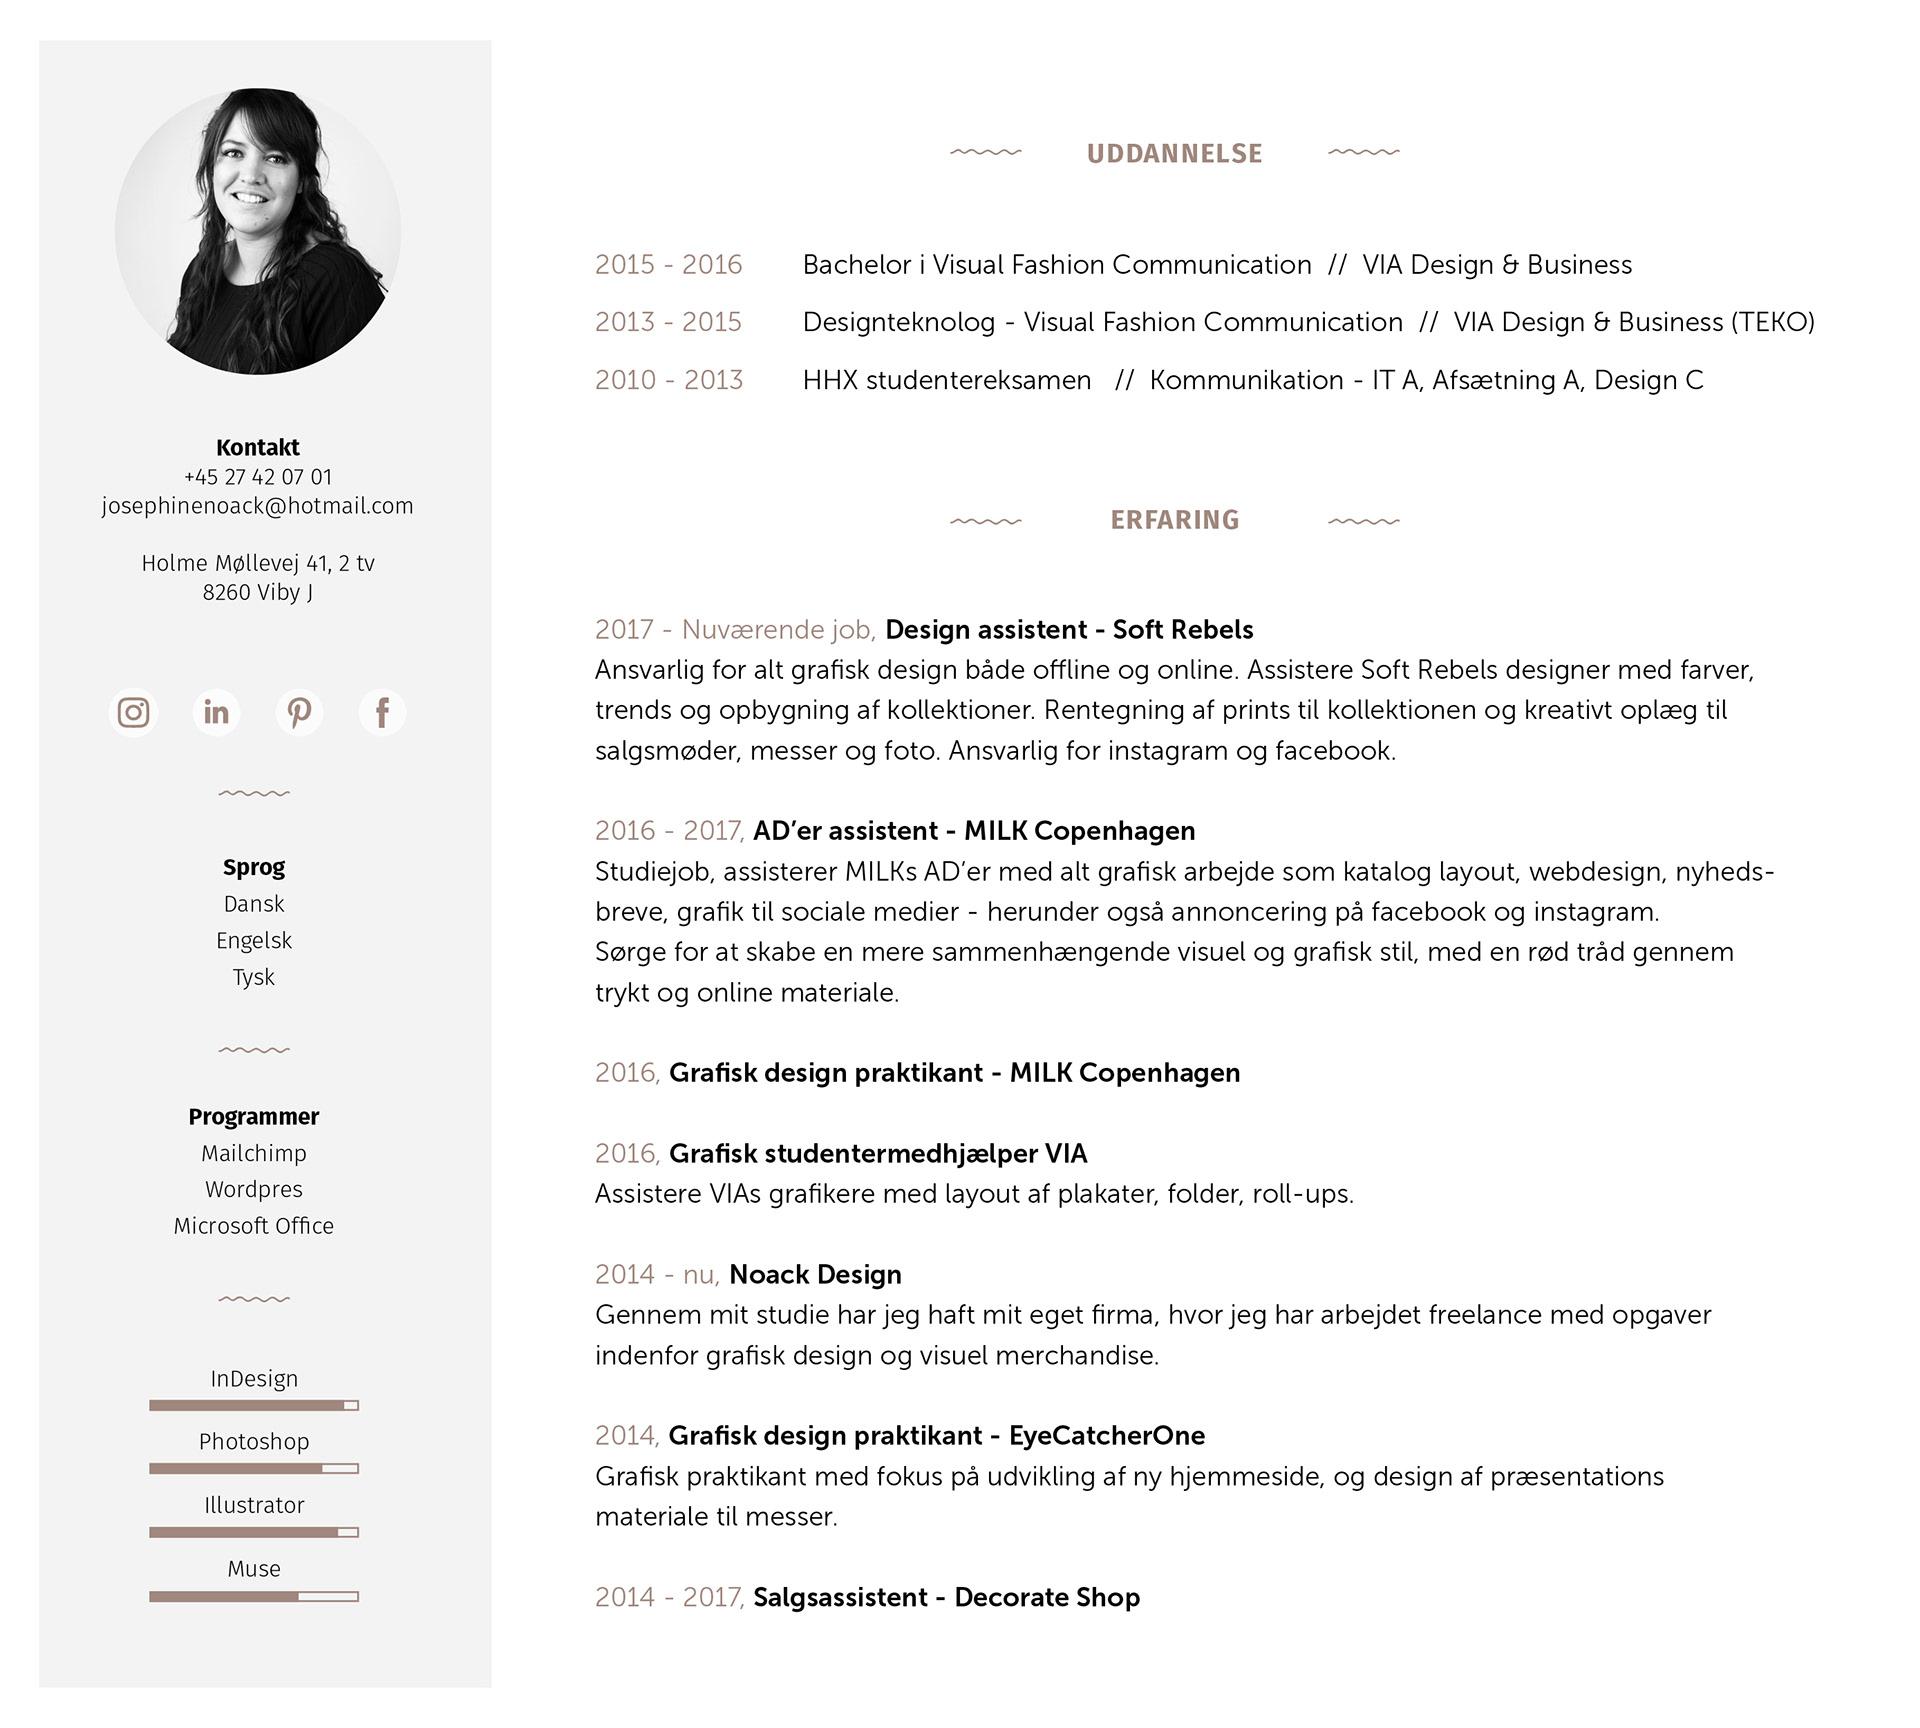 Schön Jugendprogramm Assistent Lebenslauf Fotos ...